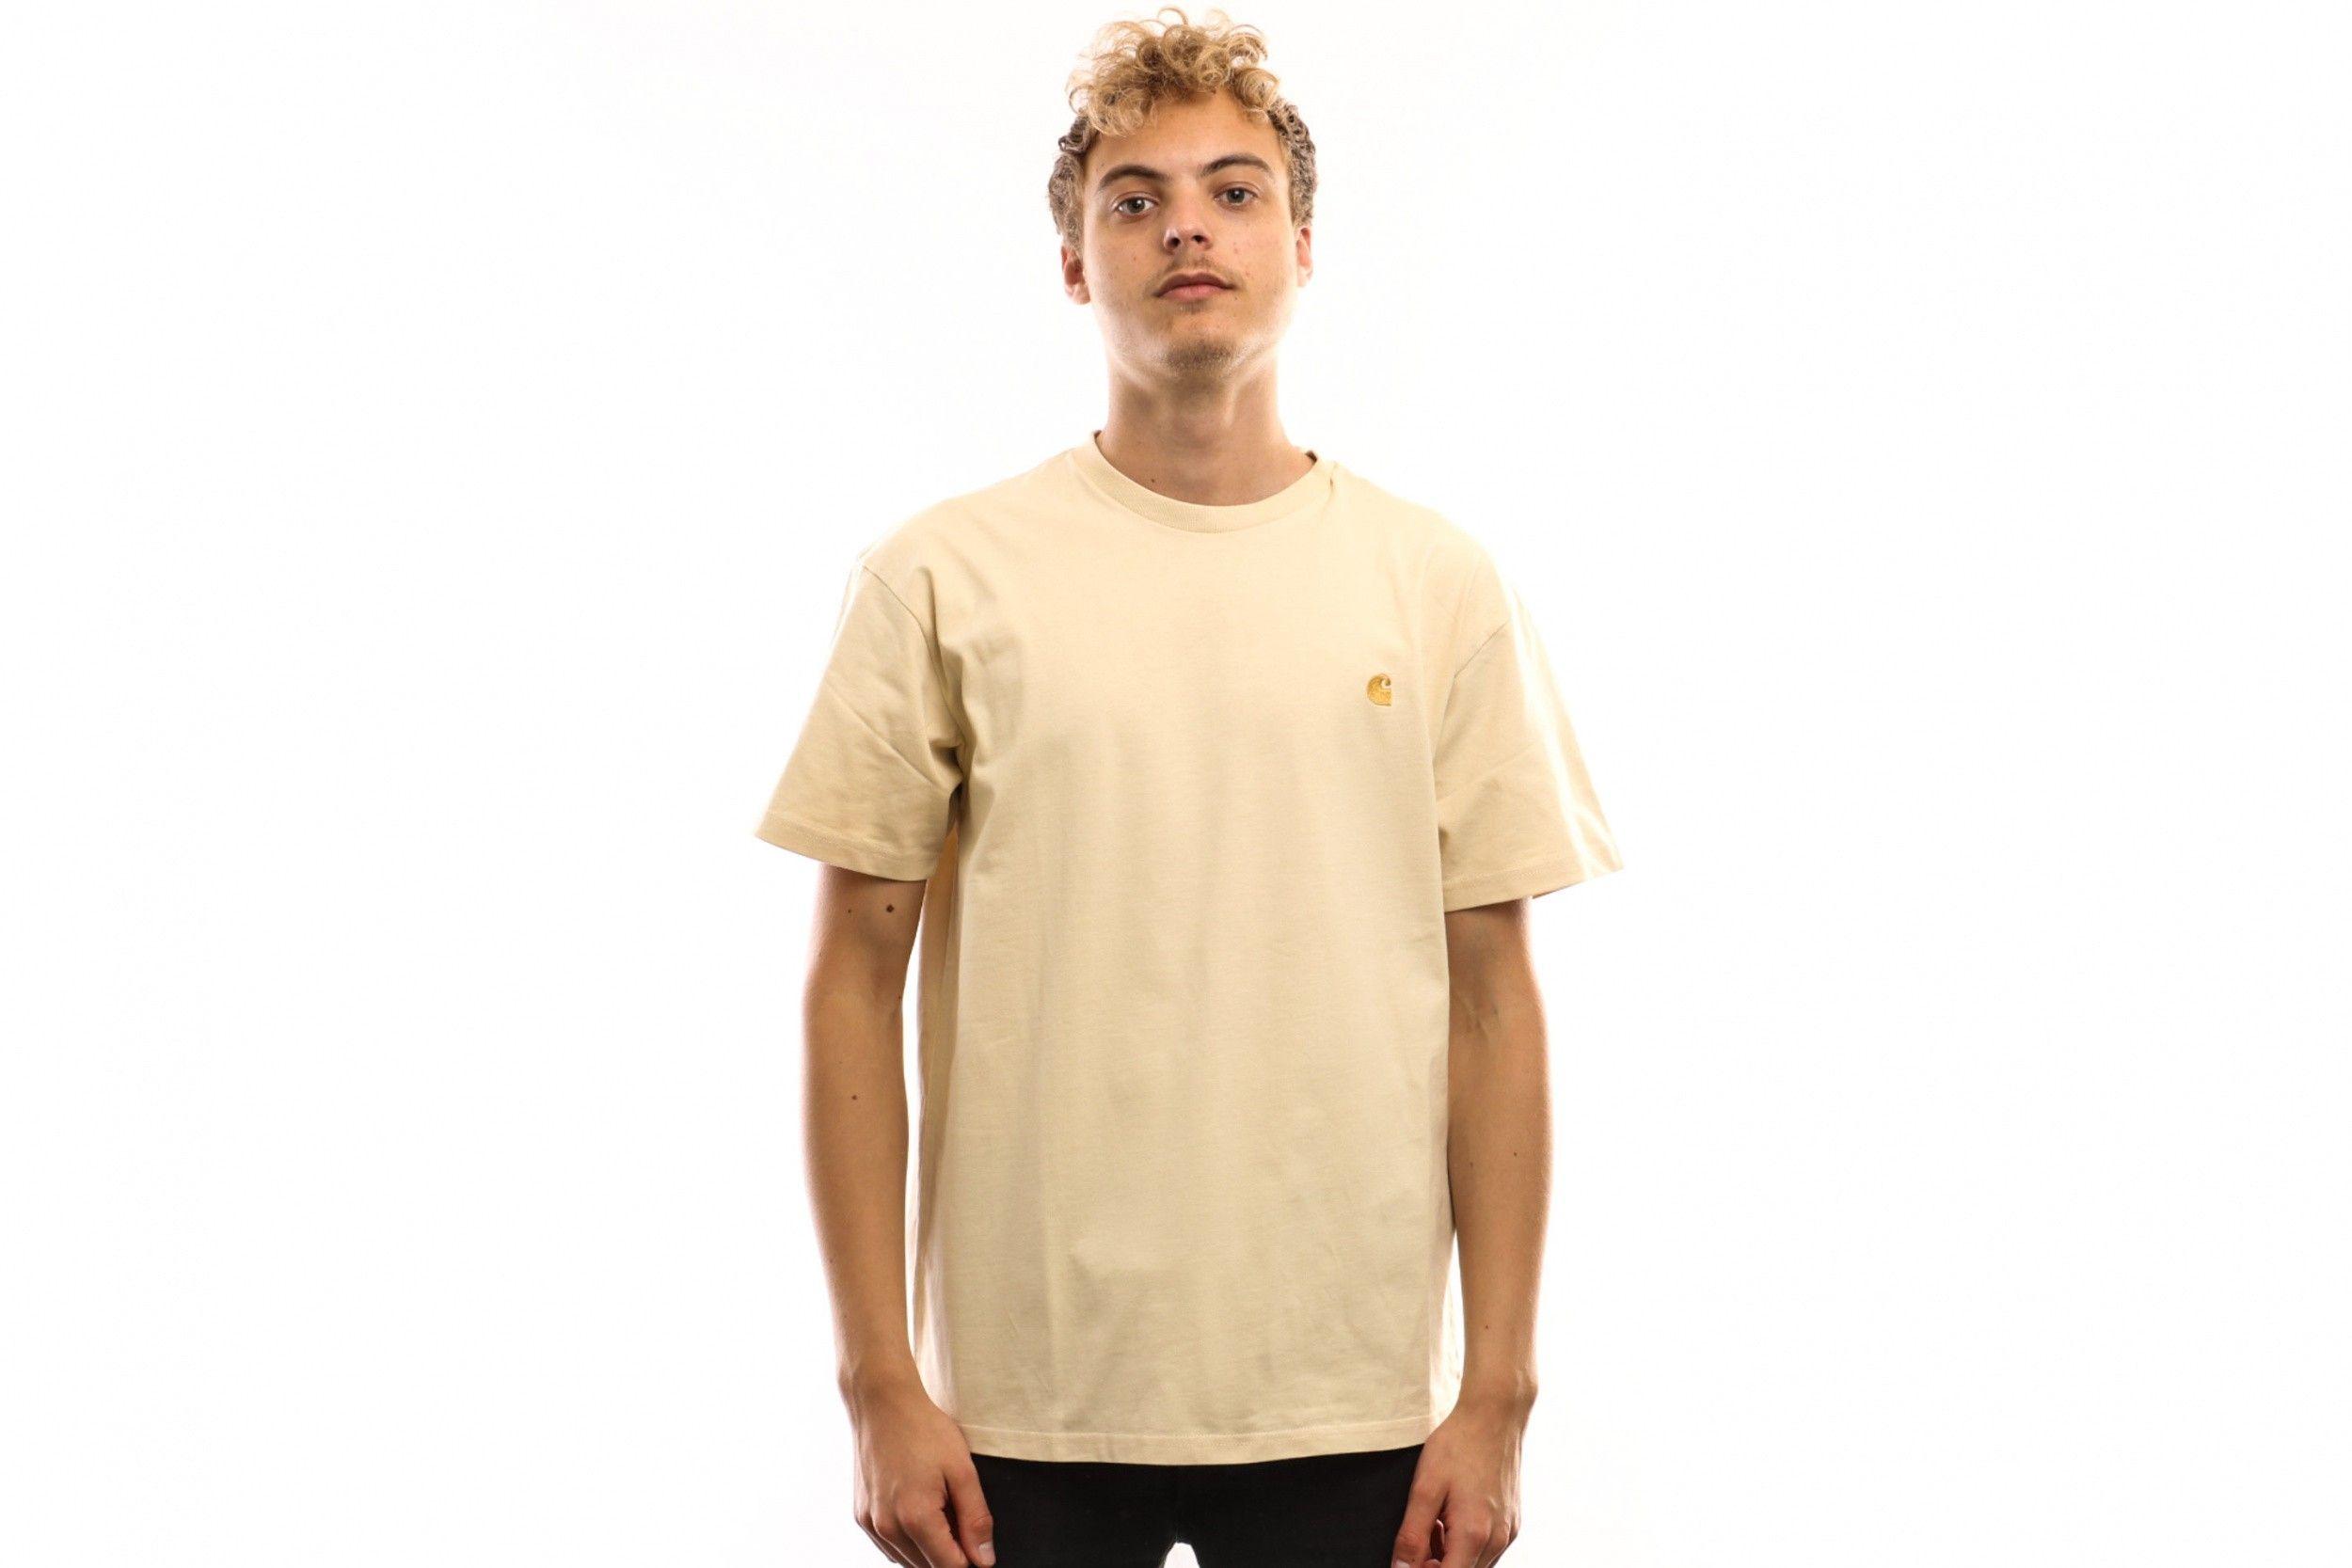 Afbeelding van Carhartt Wip S/S Chase T-Shirt I026391 T Shirt Flour / Gold